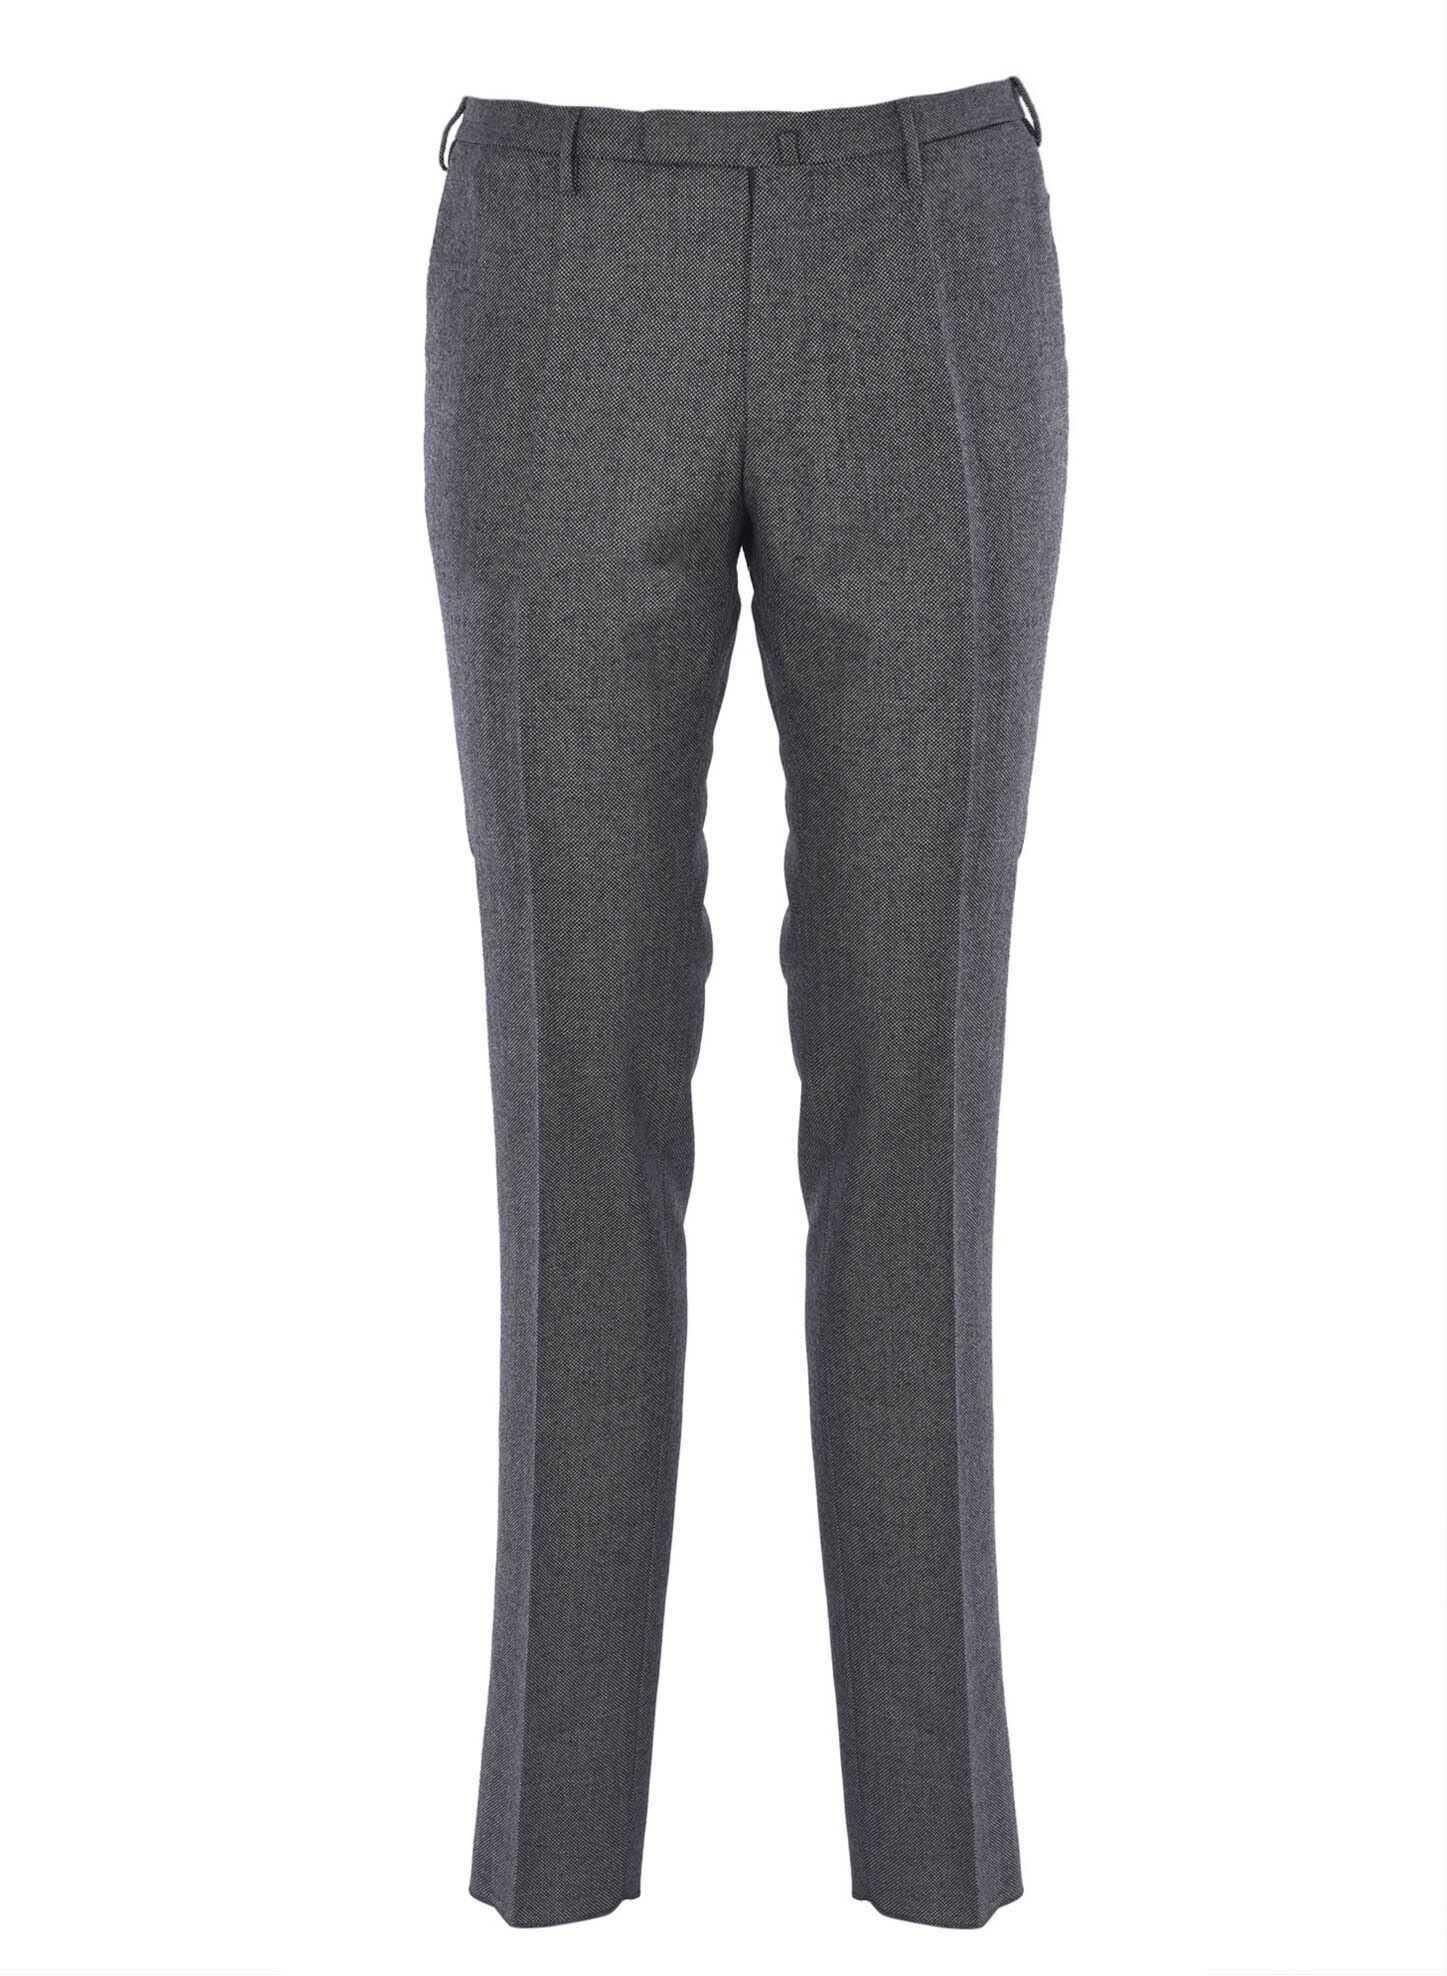 Incotex Partridge Eye Pants In Grey Grey imagine